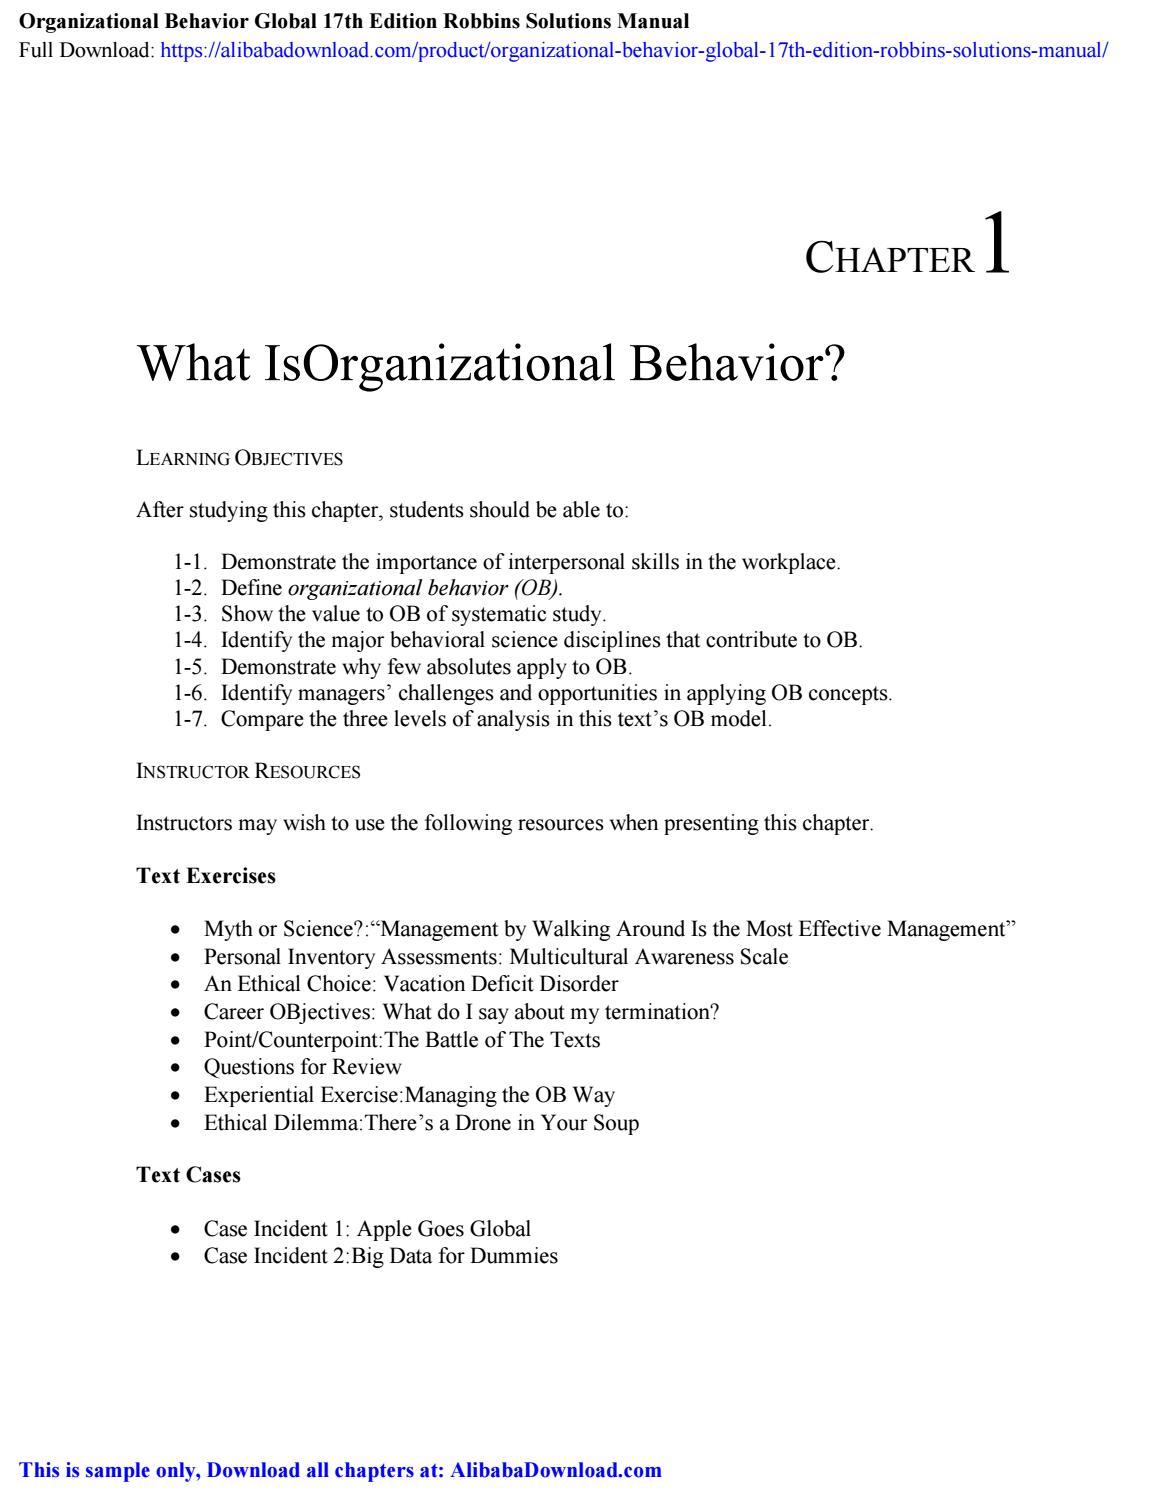 Organizational Behavior Global 17th Edition Robbins